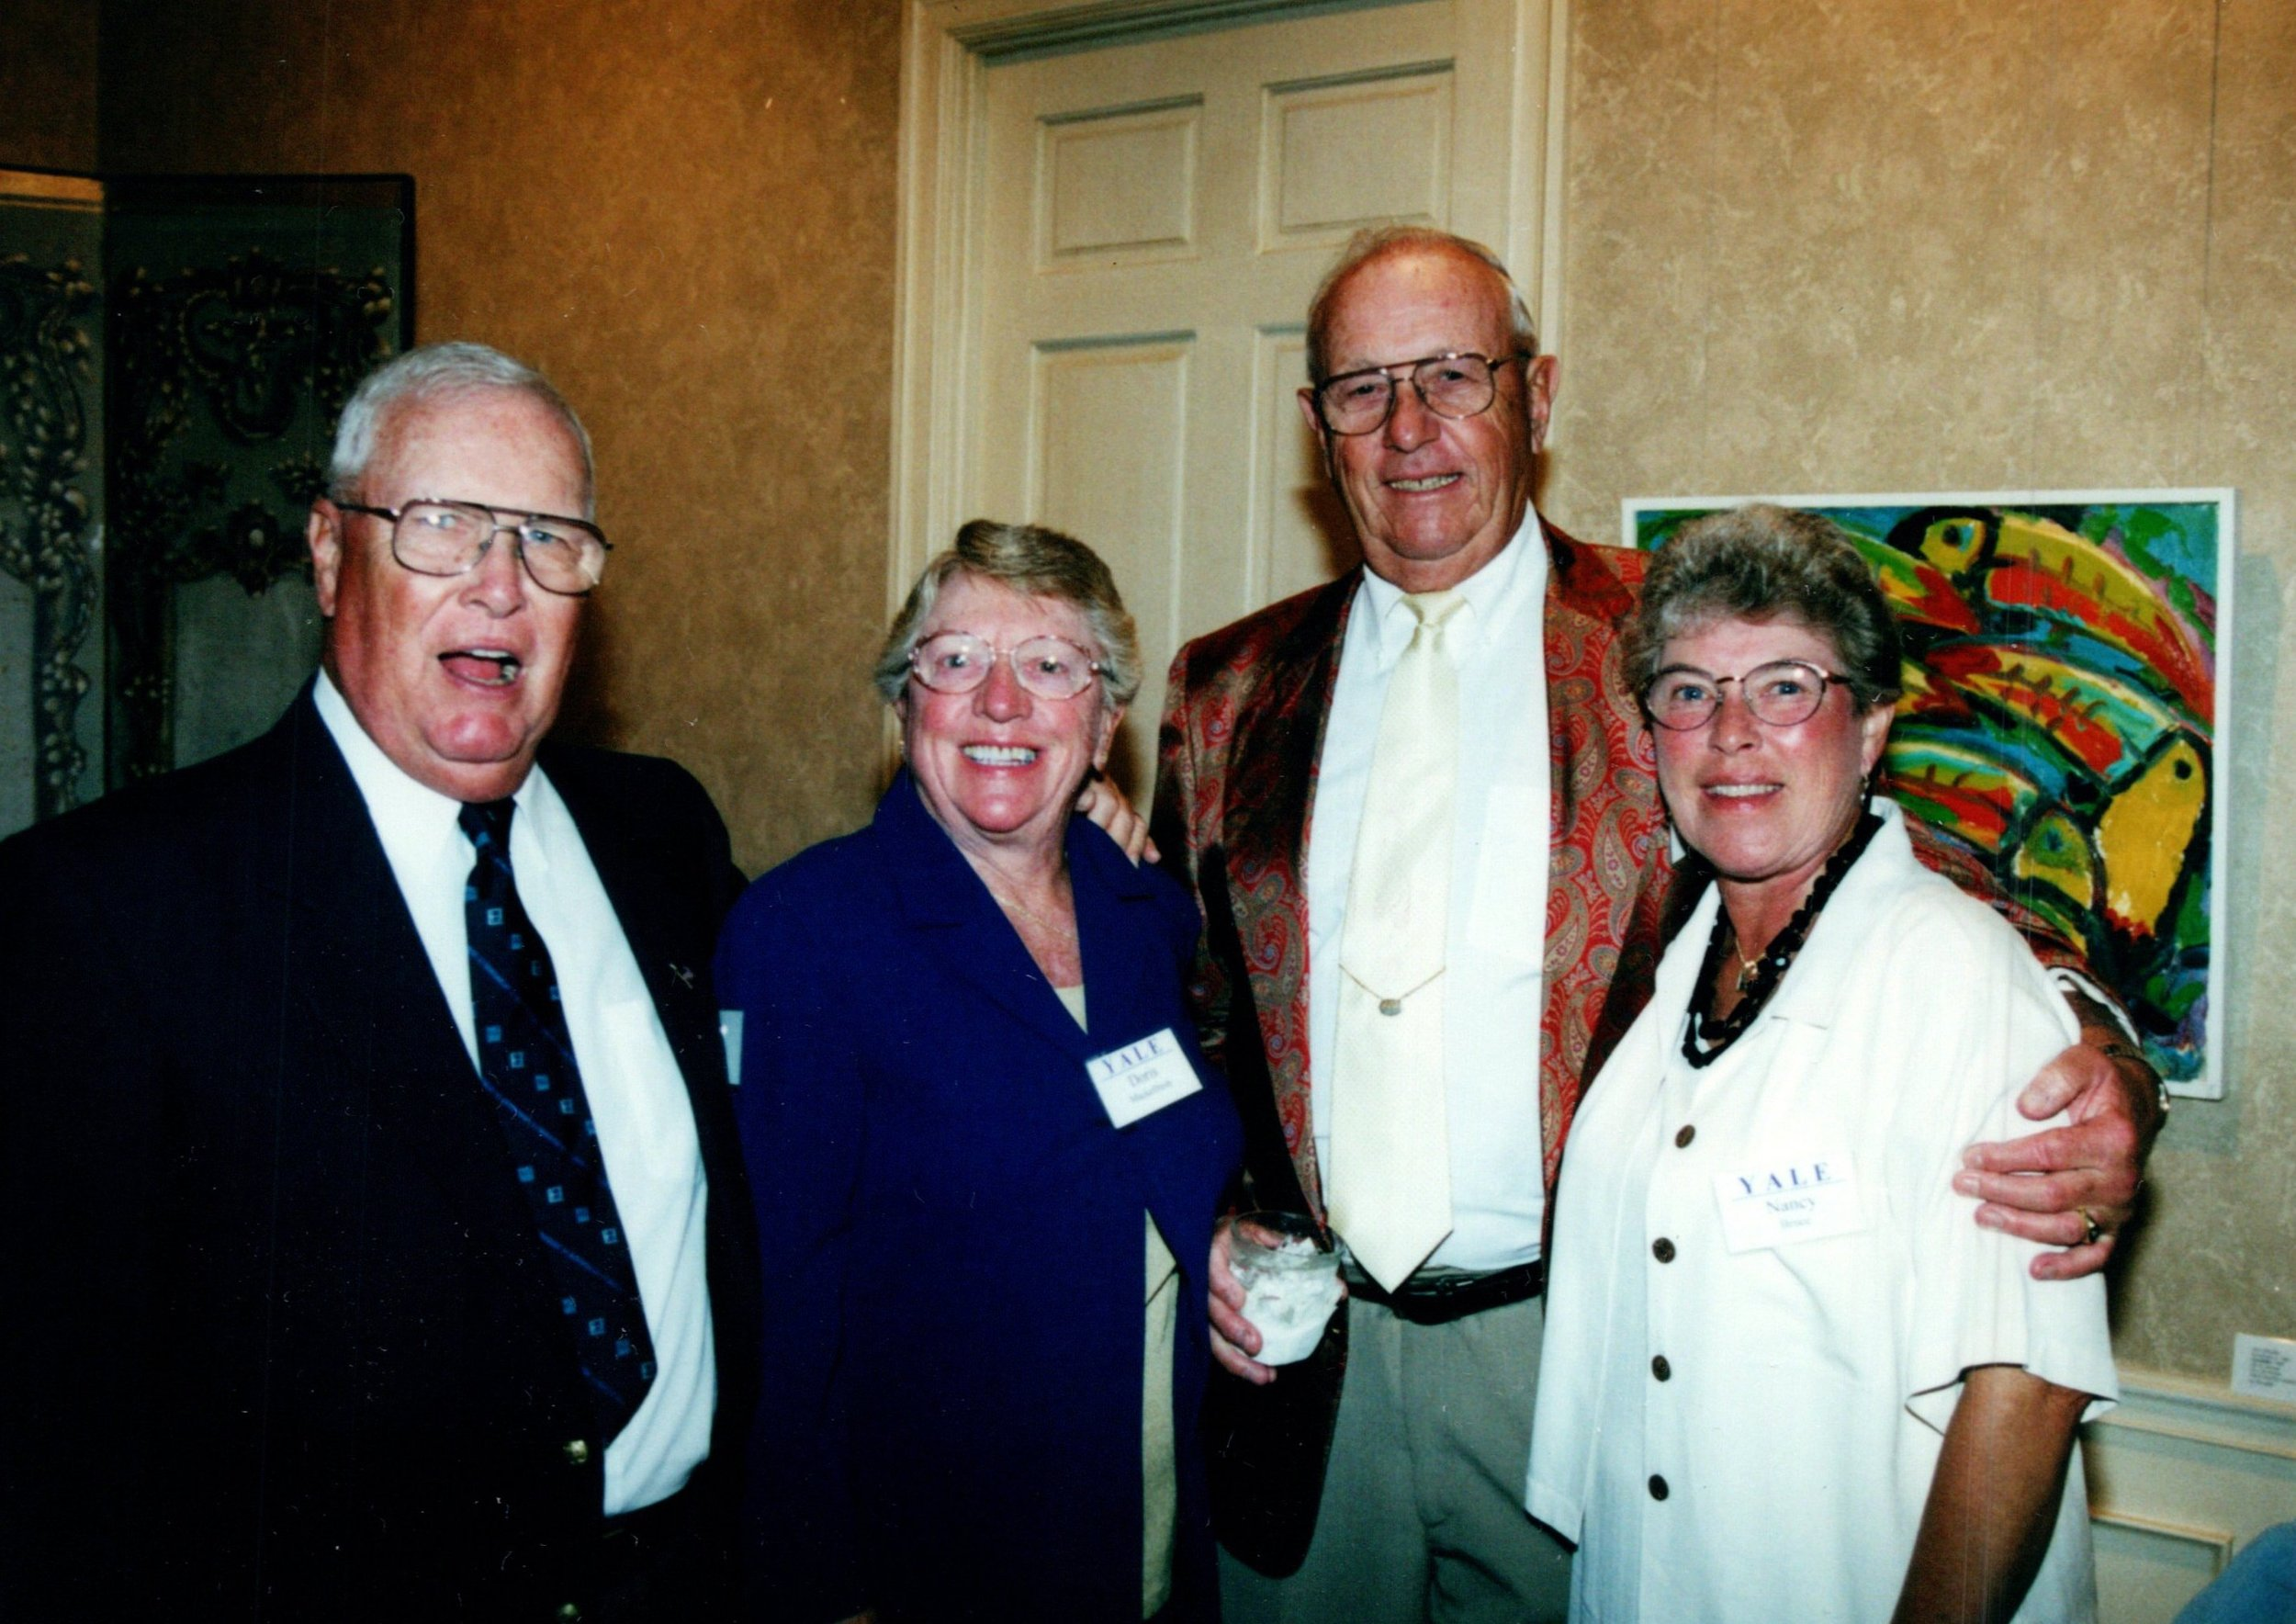 DORIS AND TOM MACKELFRESH '51, NANCY AND KEN BRUCE '53E